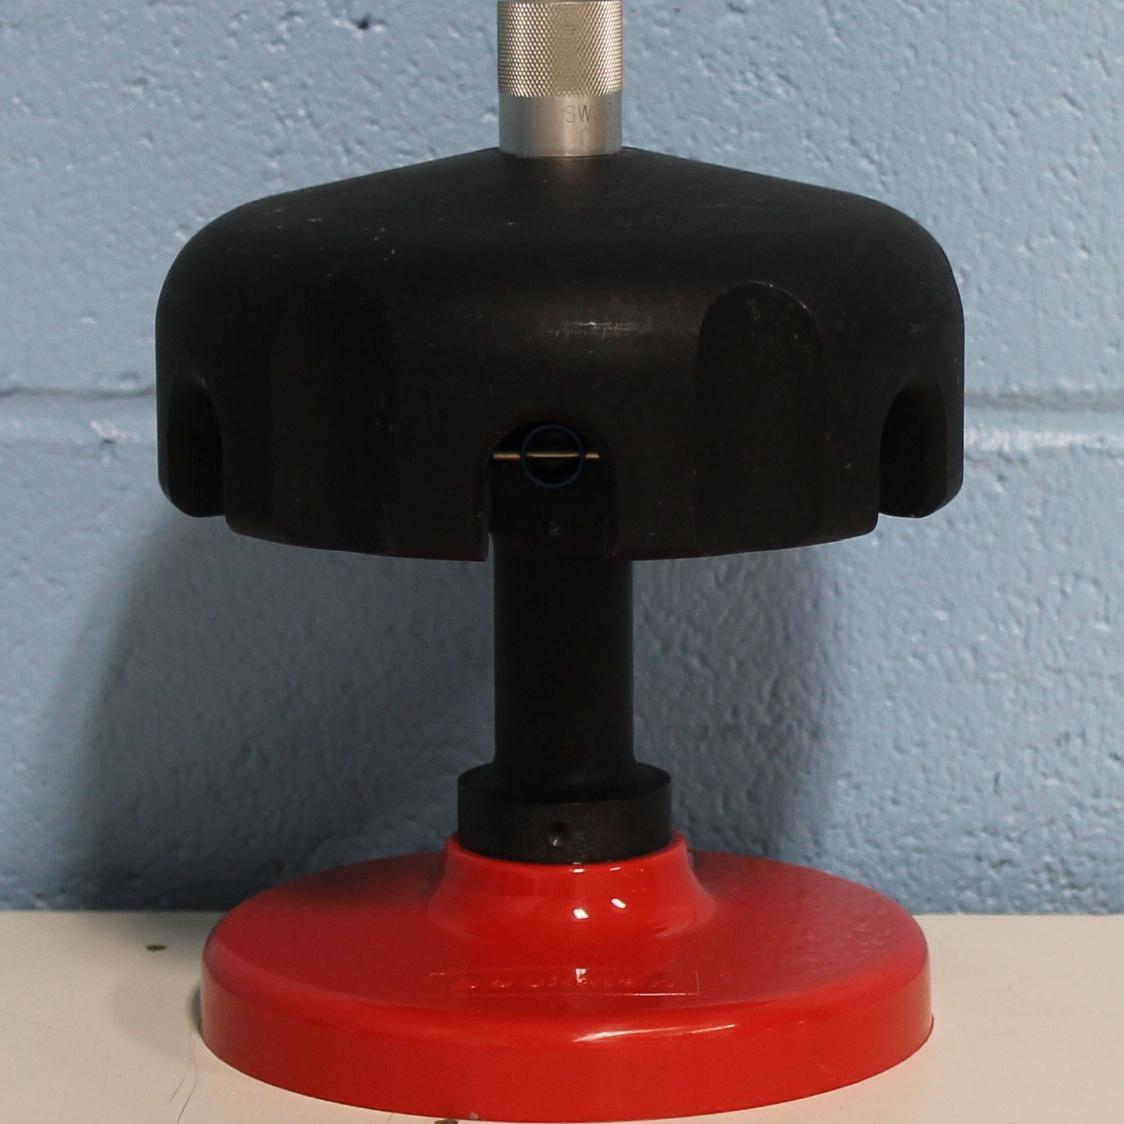 Beckman SW 50.1 Rotor Image